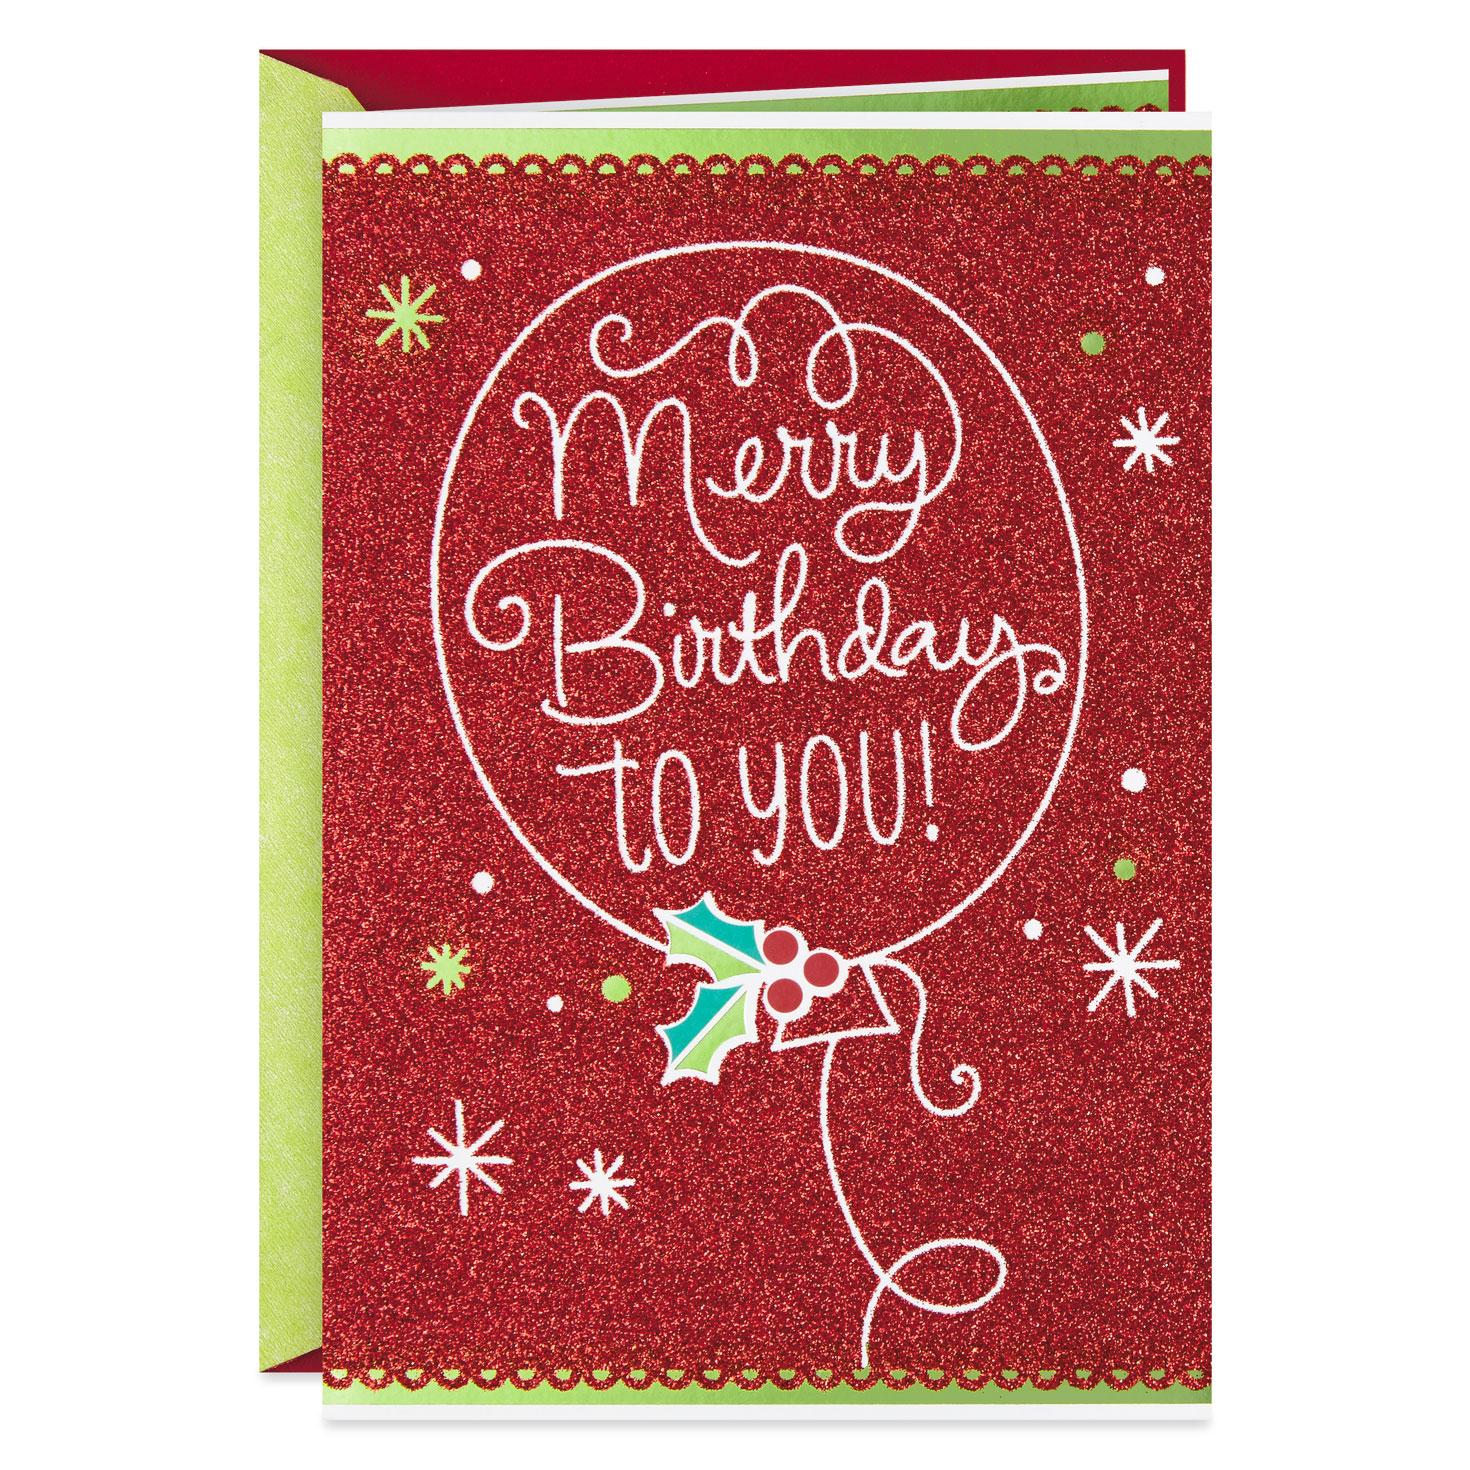 Baby Logo Collection: Merry Birthday December 25th Birthday Christmas Card